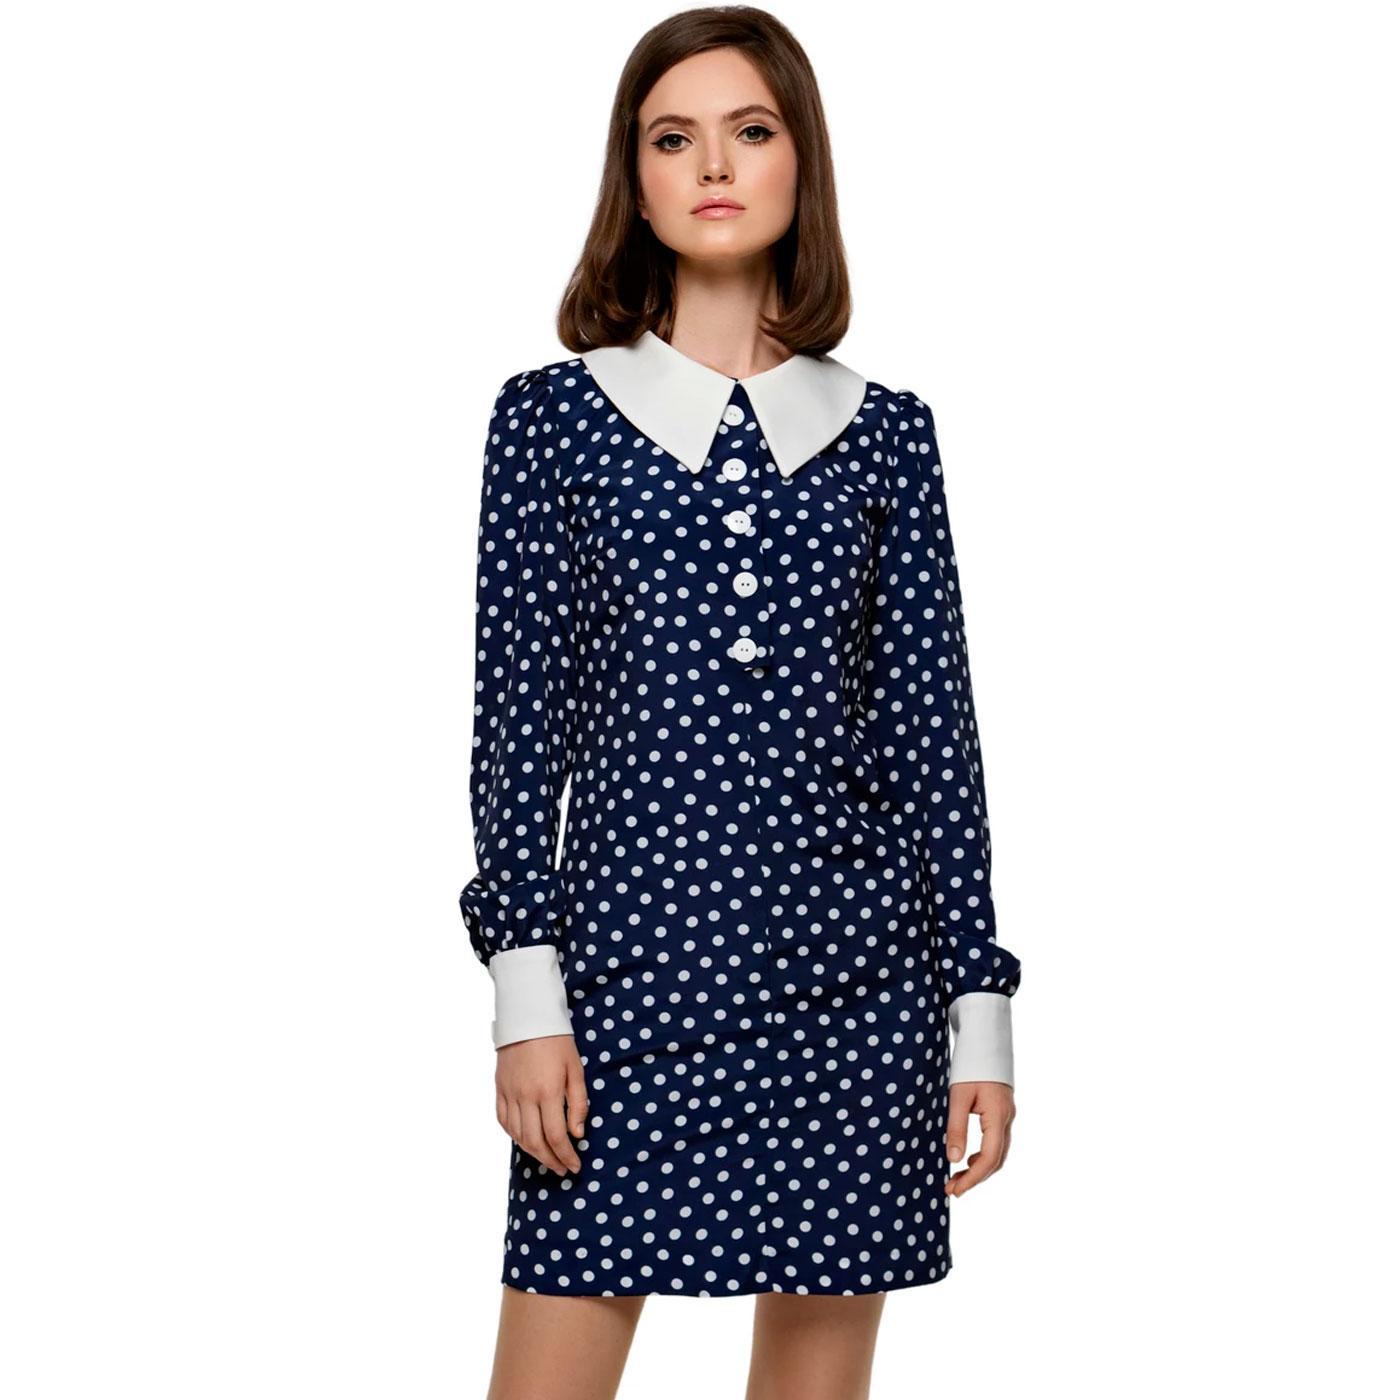 MARMALADE Retro Polka Dot Shift Dress - Navy/White